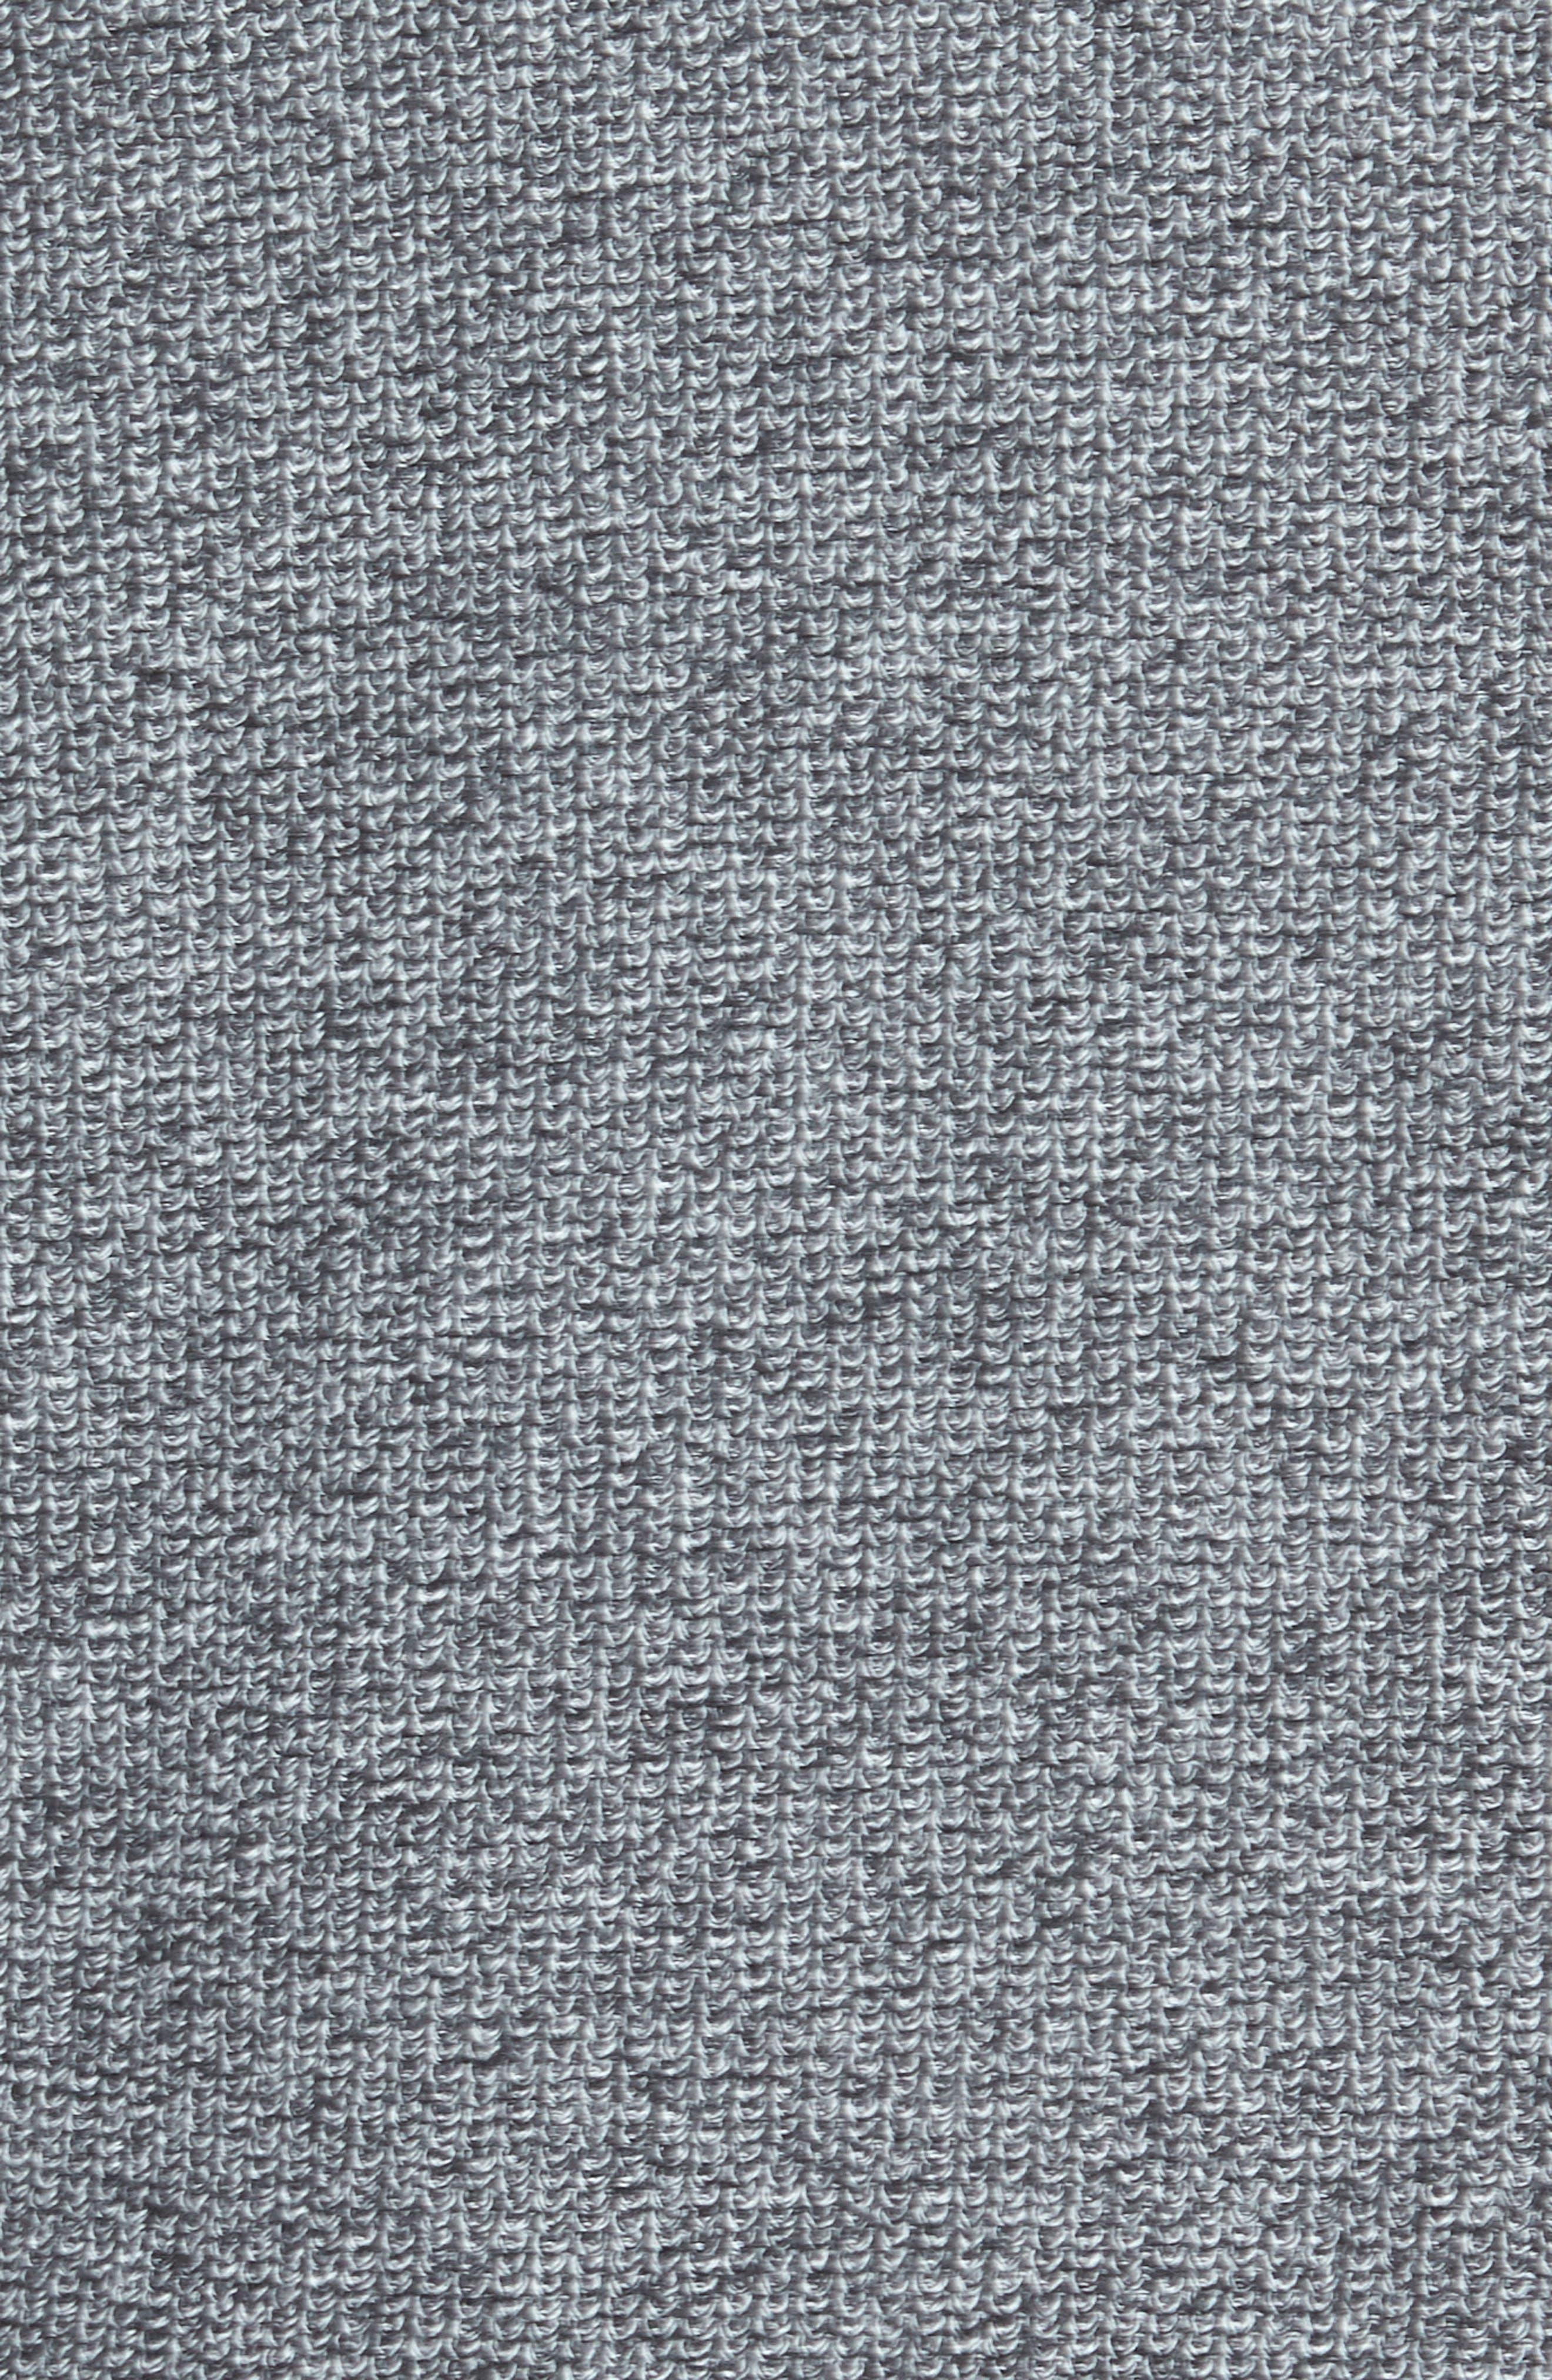 Marled Mock Neck Zip Sweater,                             Alternate thumbnail 5, color,                             BLACK IVORY MARL